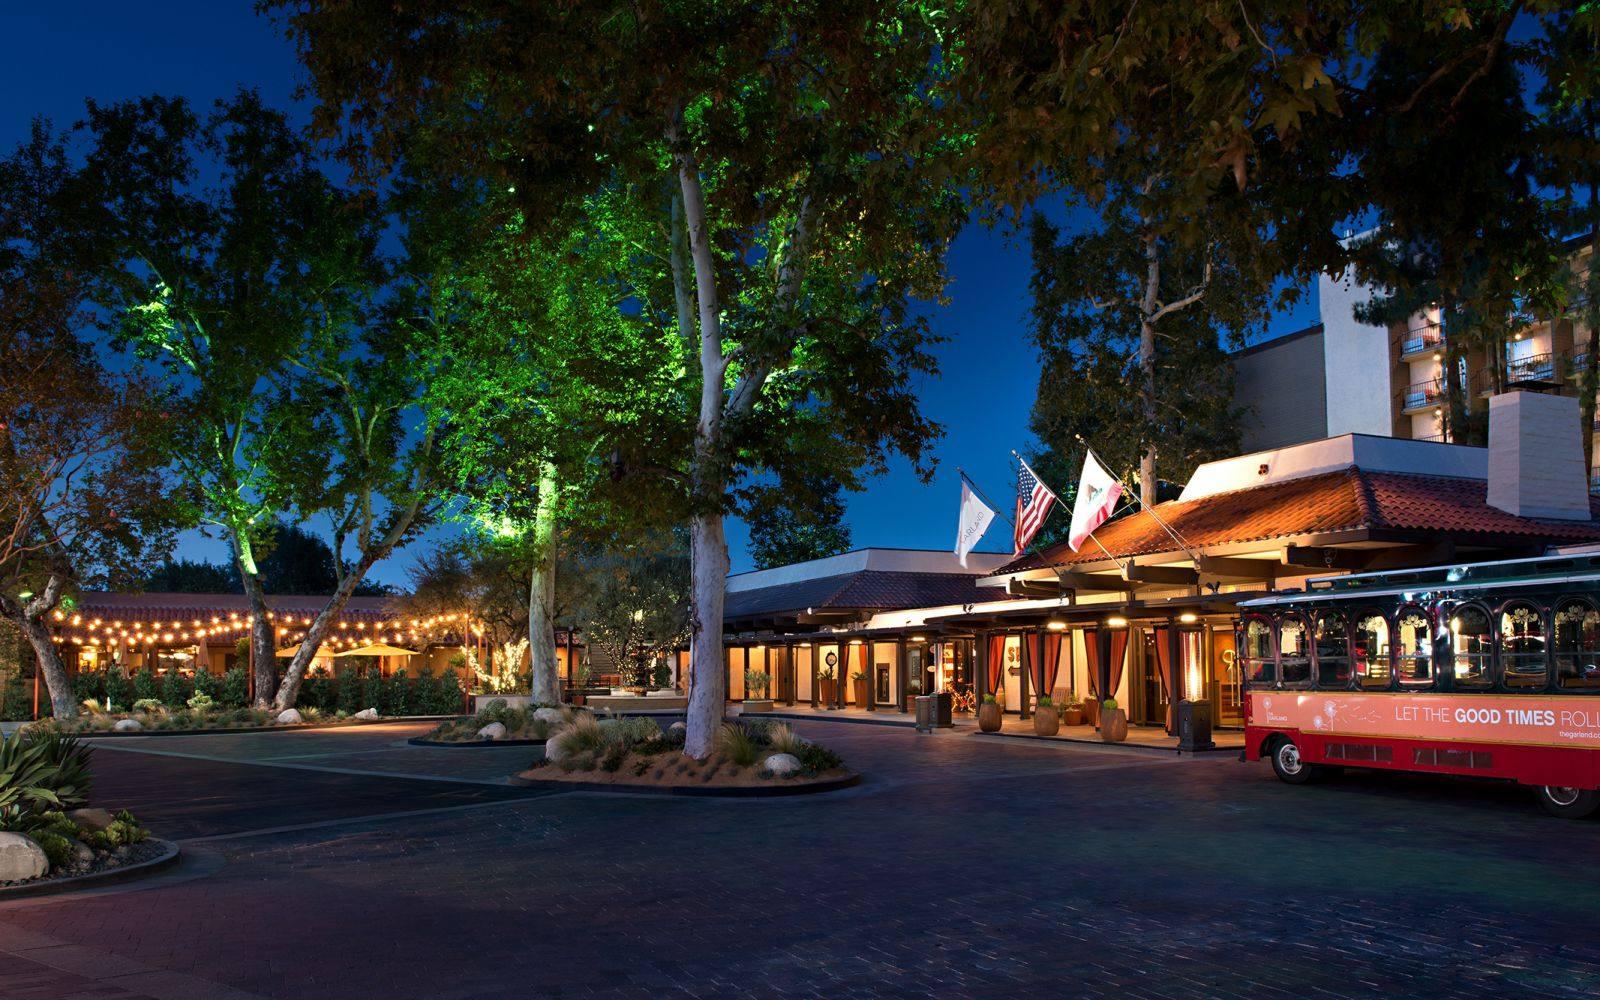 The Garland hotel entrance at night